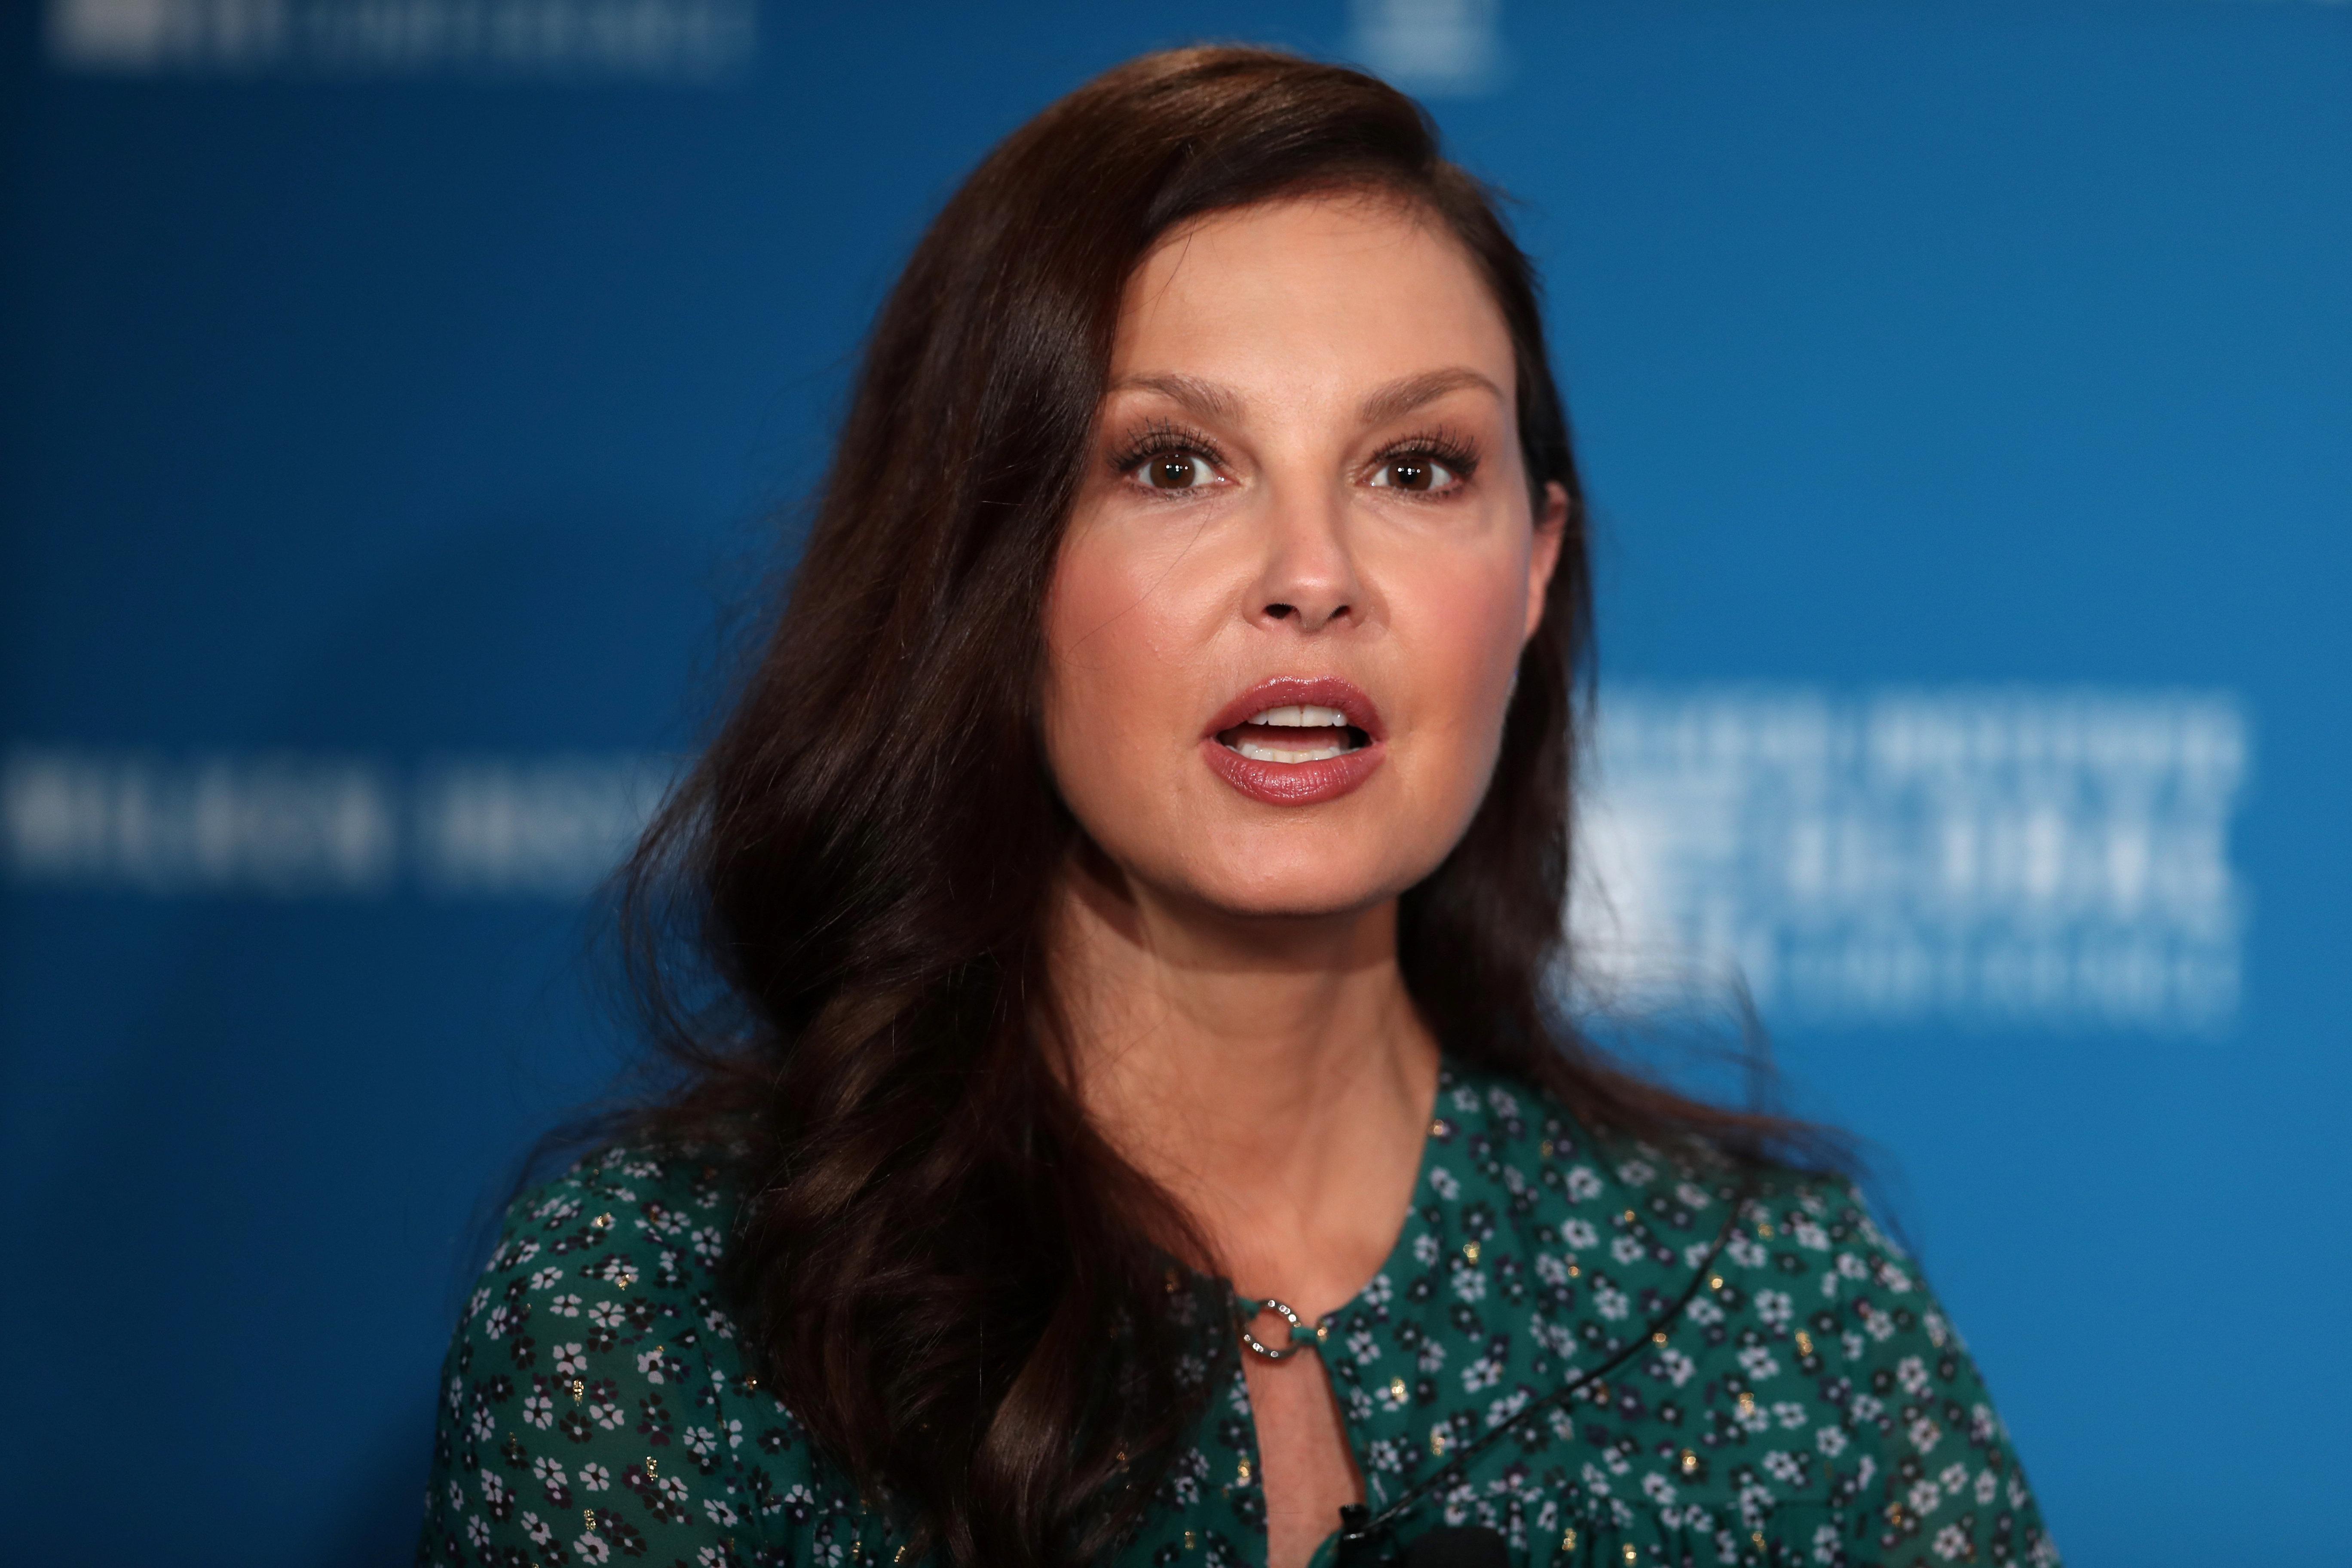 Ashley Judd's Sexual Harassment Claim Against Harvey Weinstein